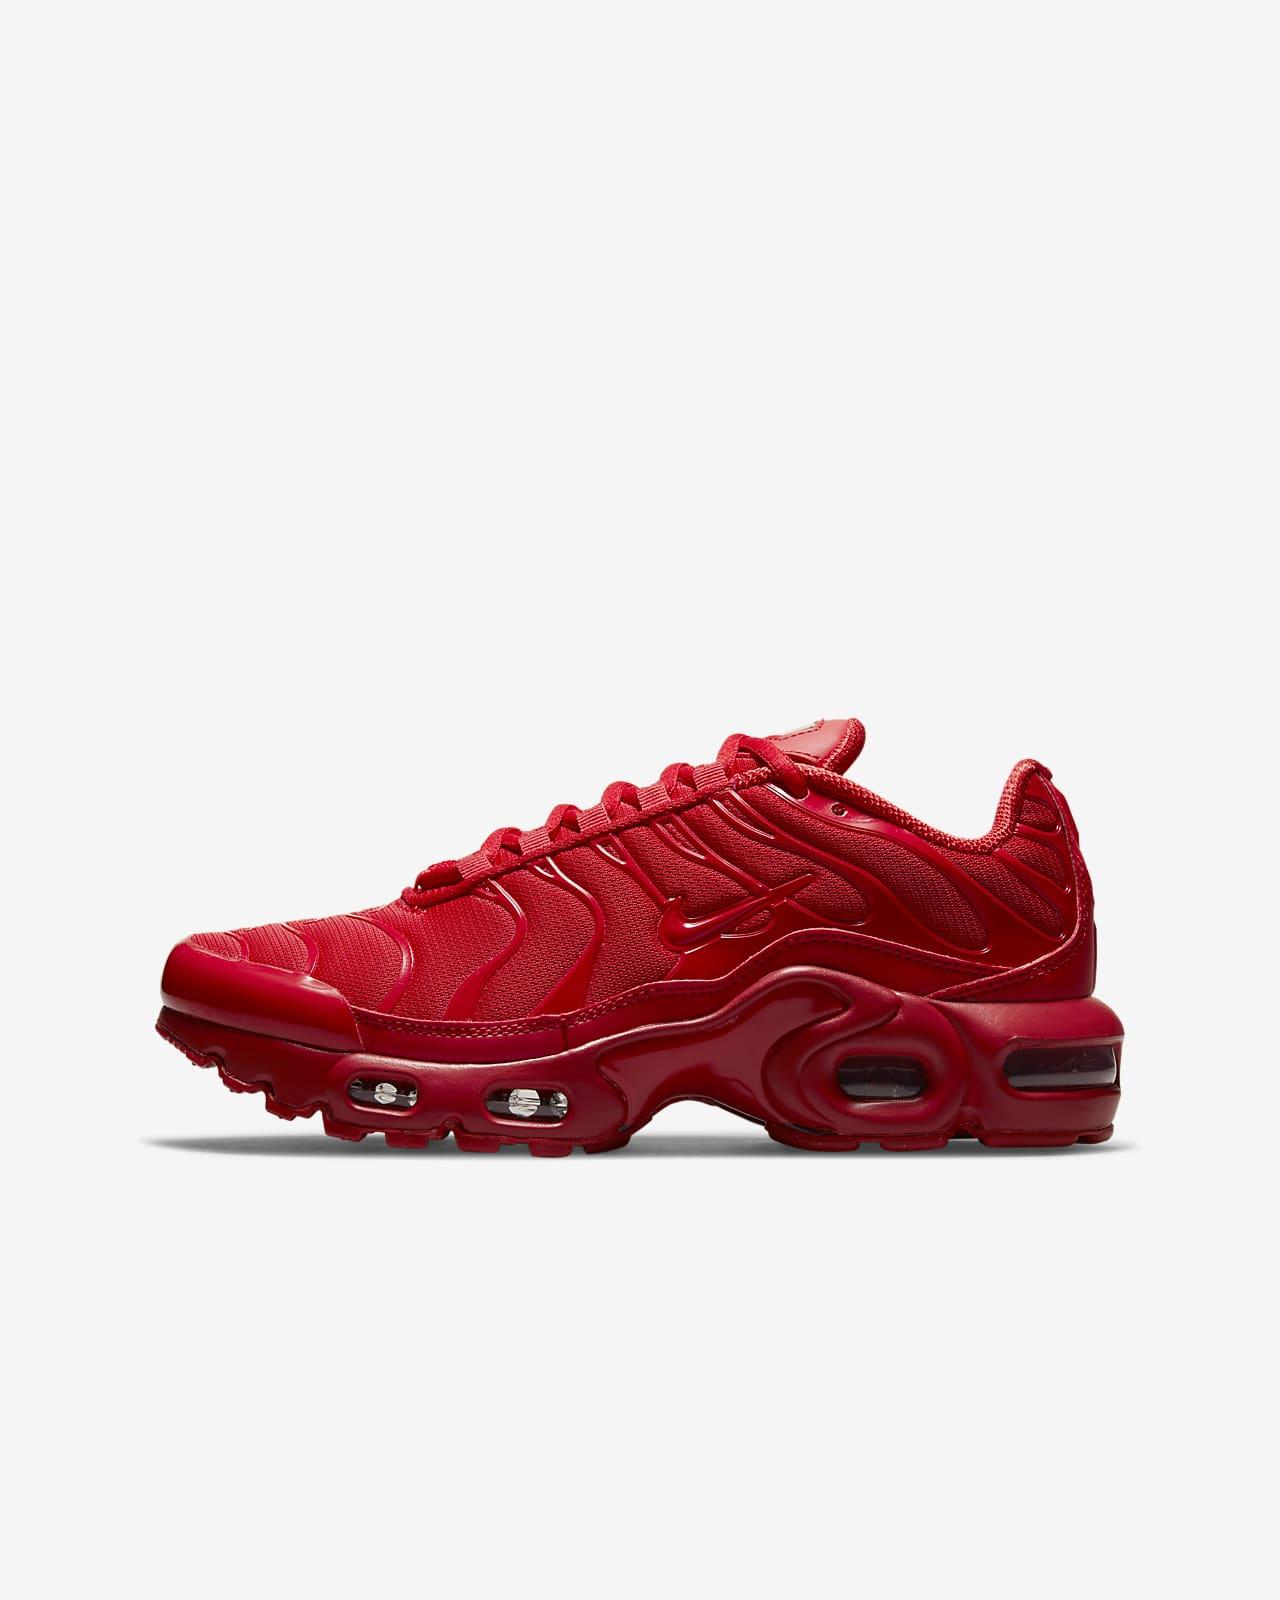 Nike Air Max Plus Big Kids' Shoe